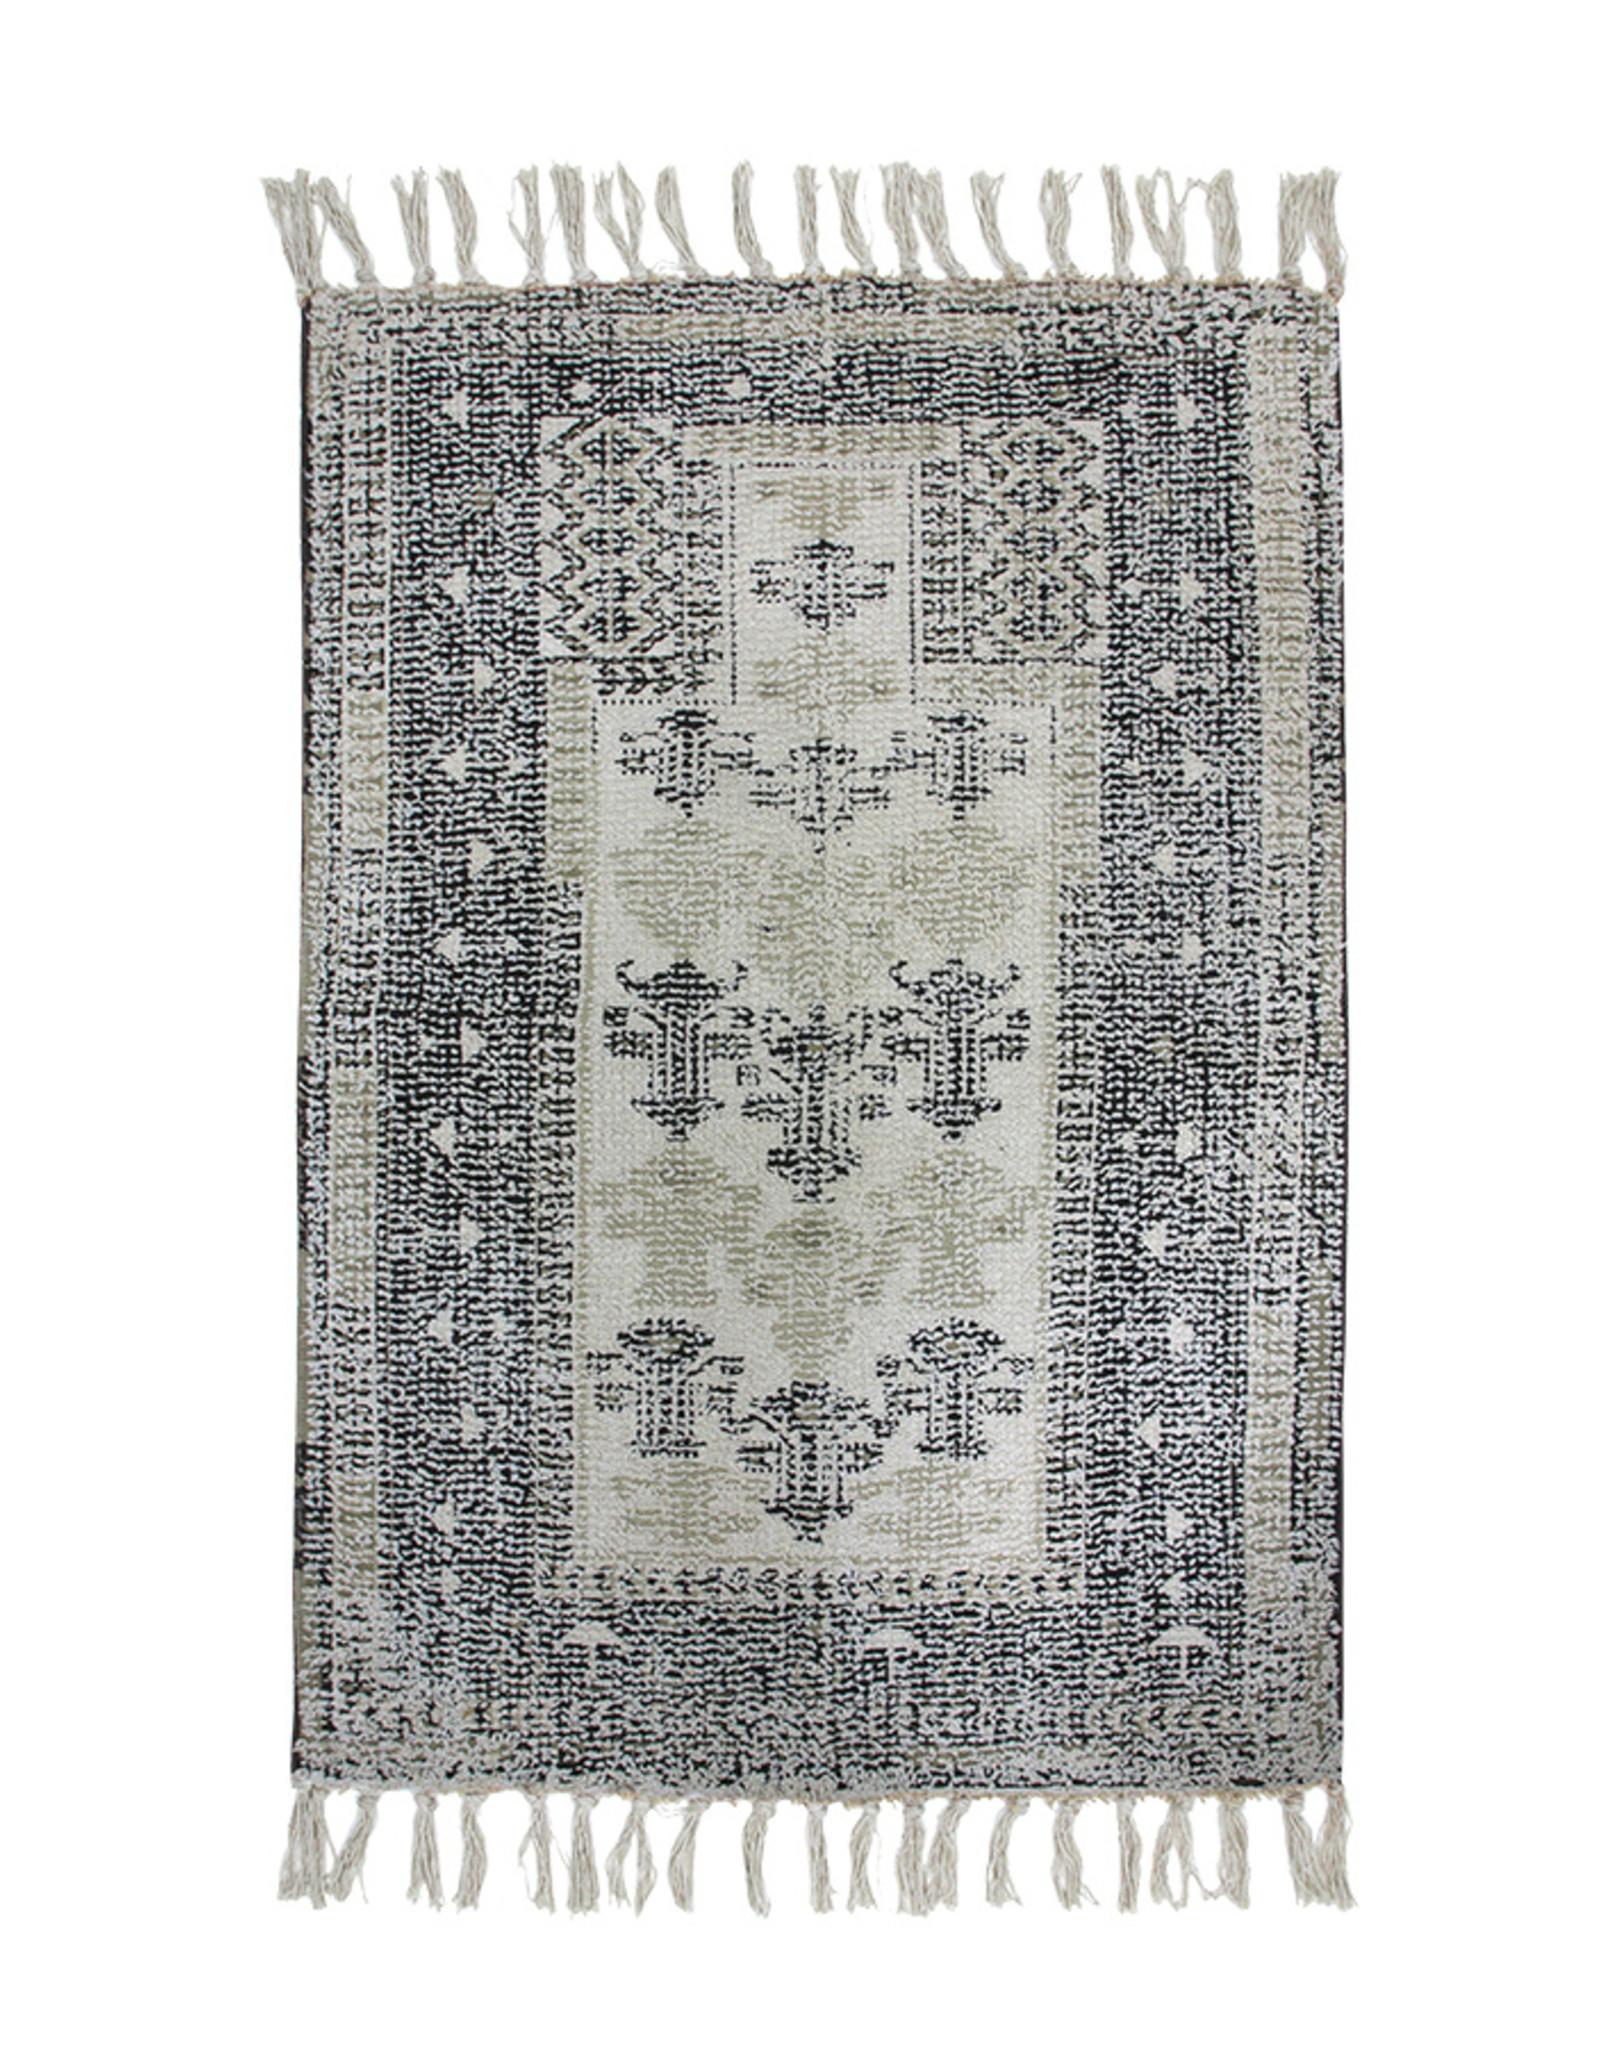 HK Living Badmat 60 x 90 cm zwart/wit getuft met antislip